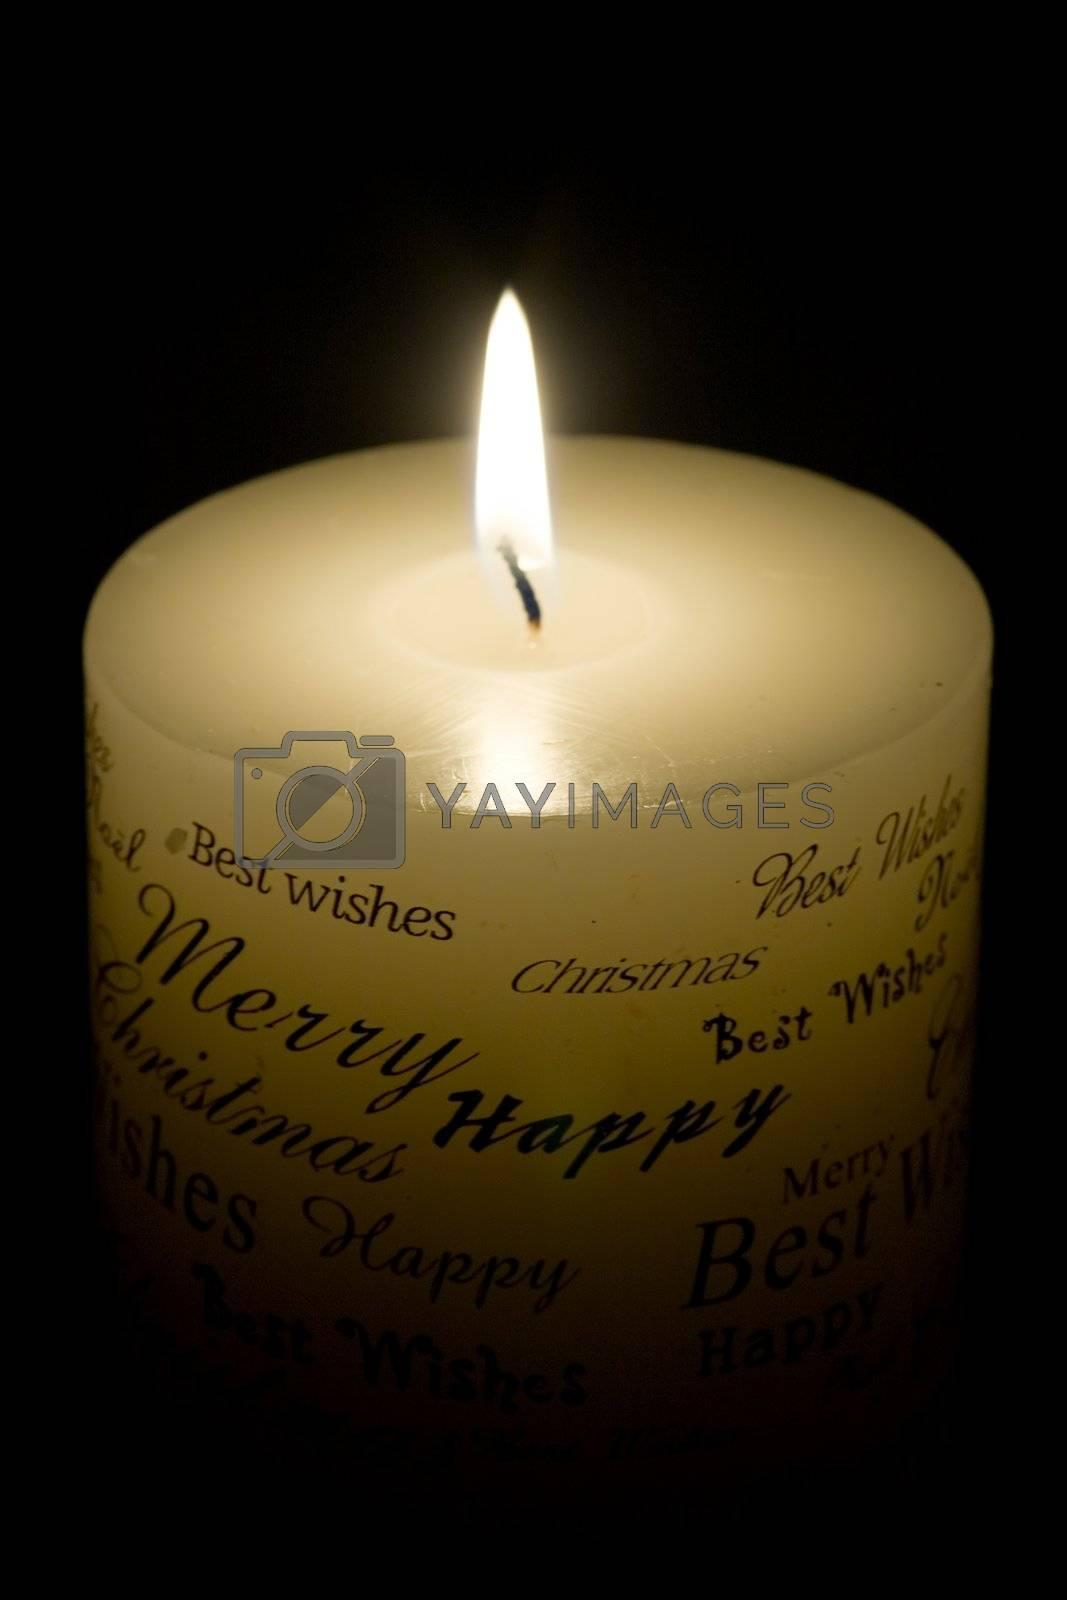 Lit white Christmas candle on black background